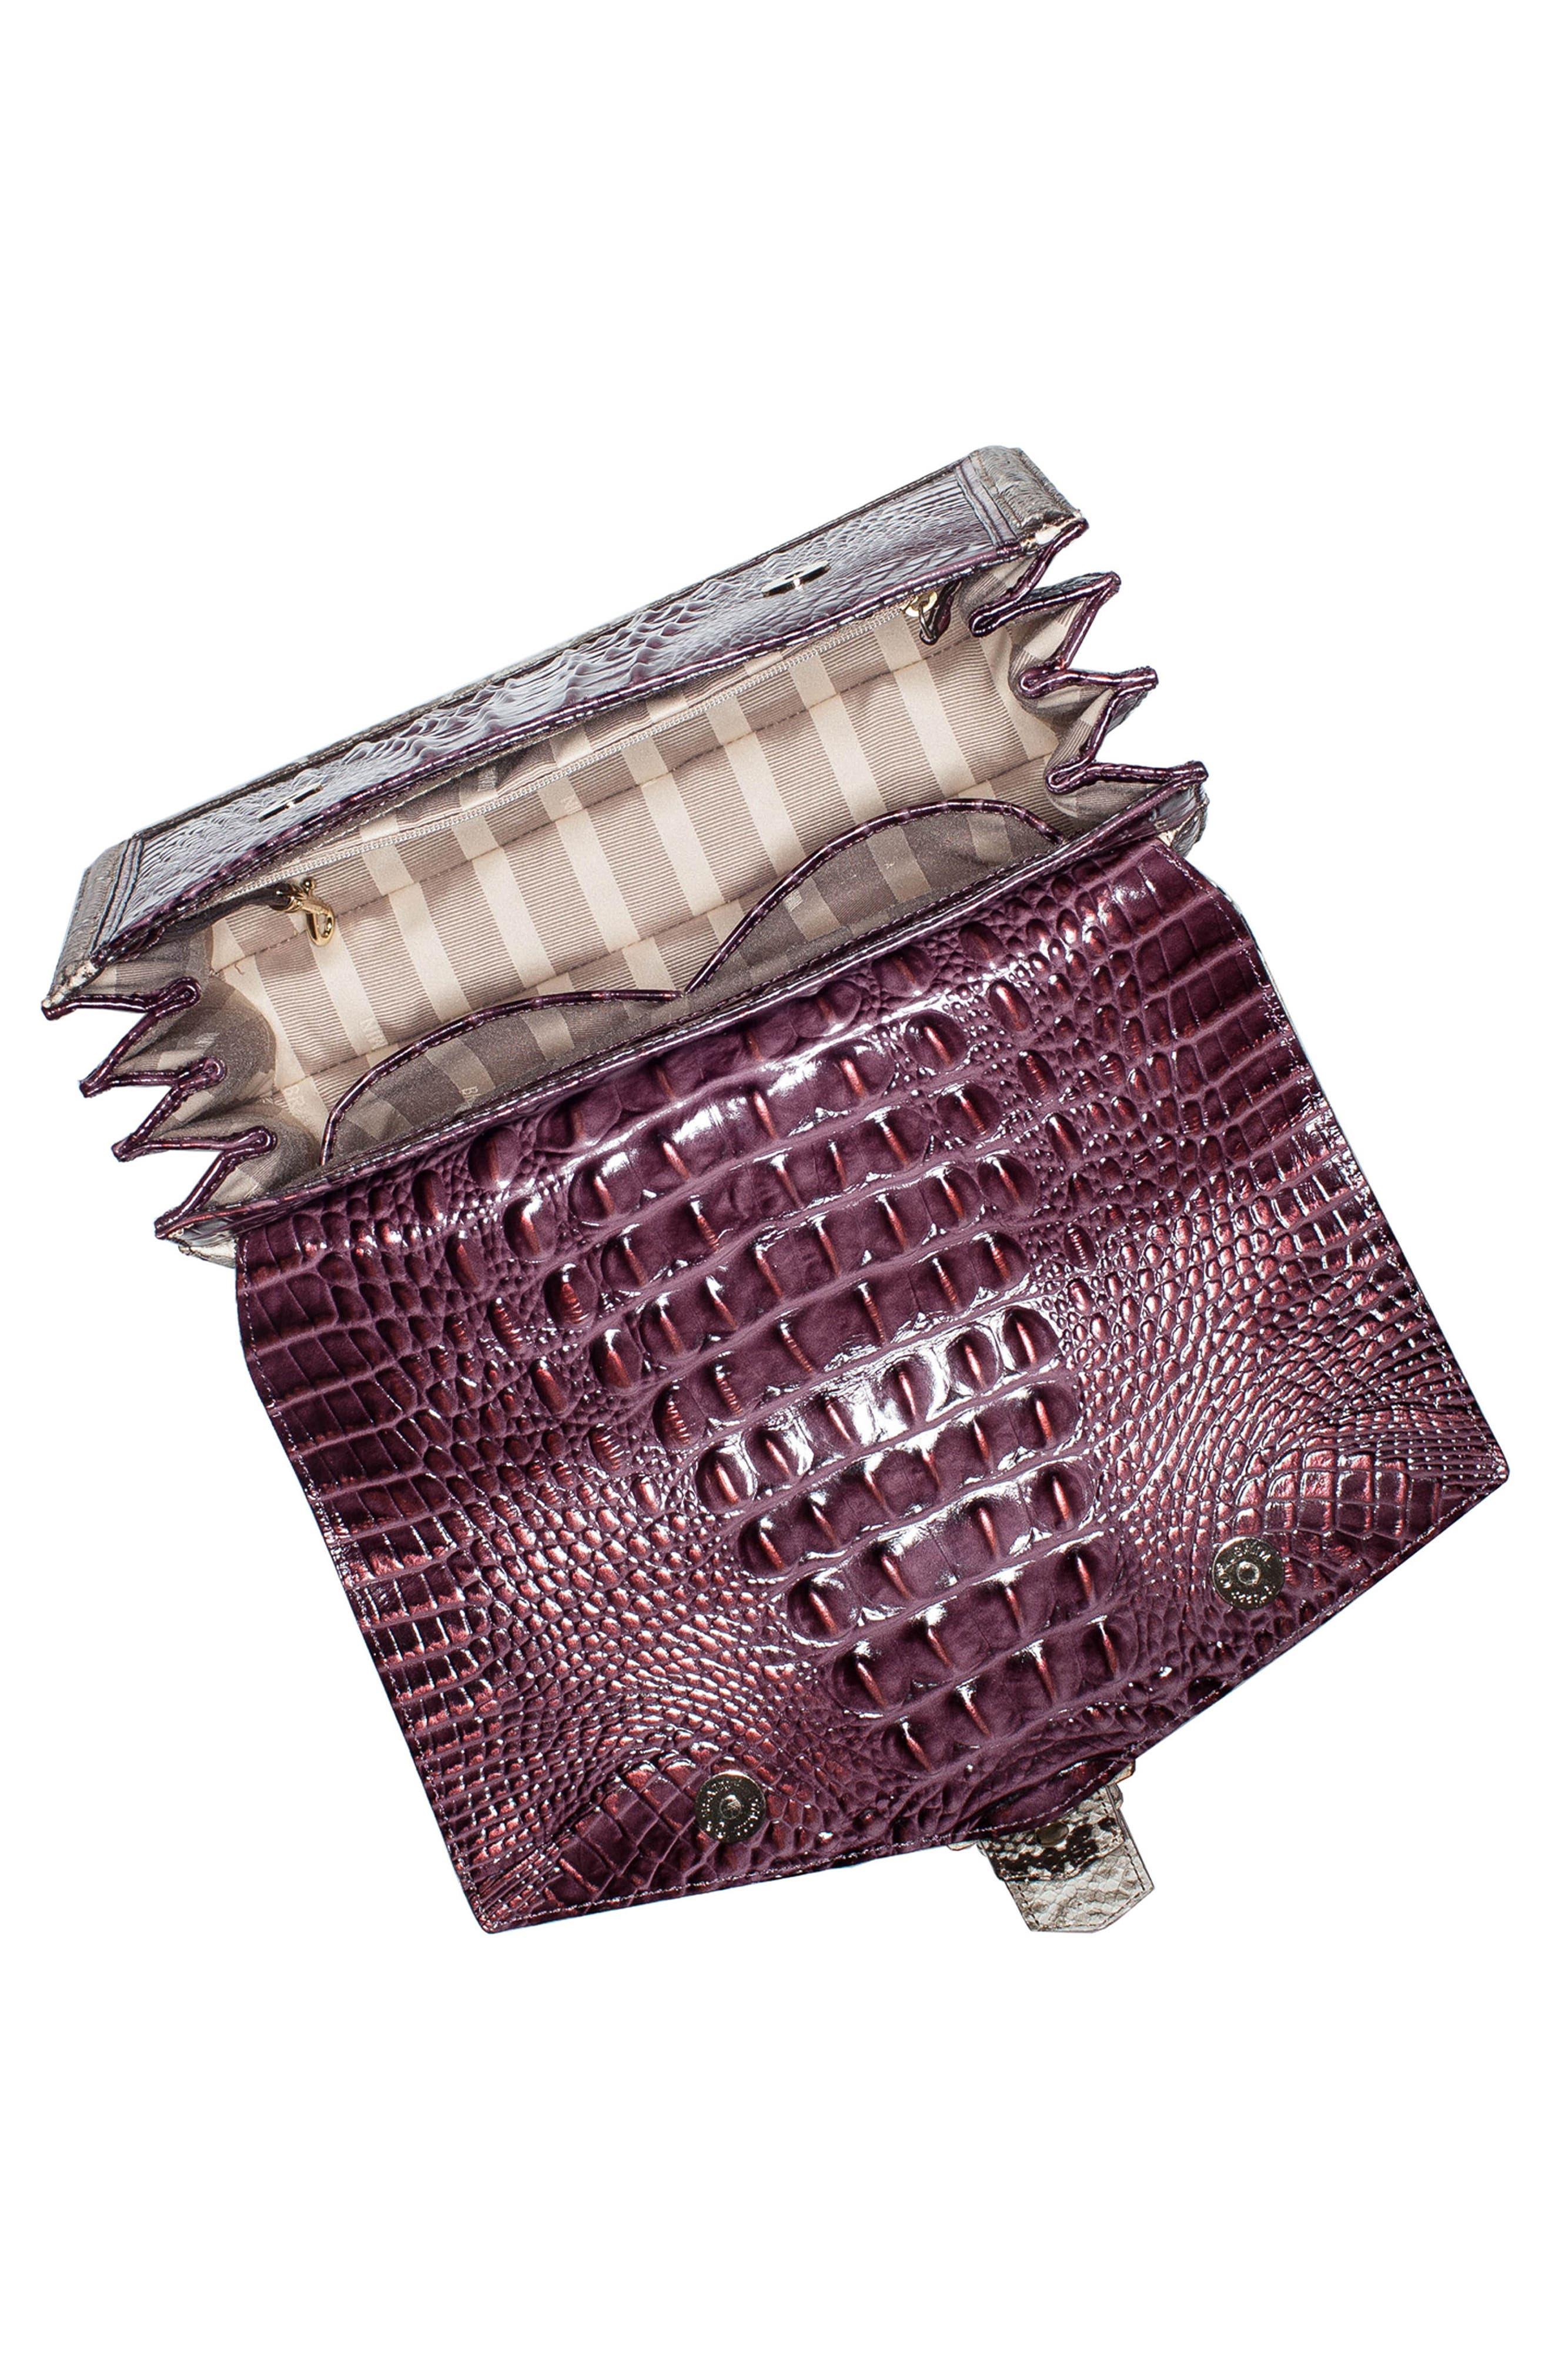 Gabriella Croc-Embossed Leather Satchel,                             Alternate thumbnail 3, color,                             504